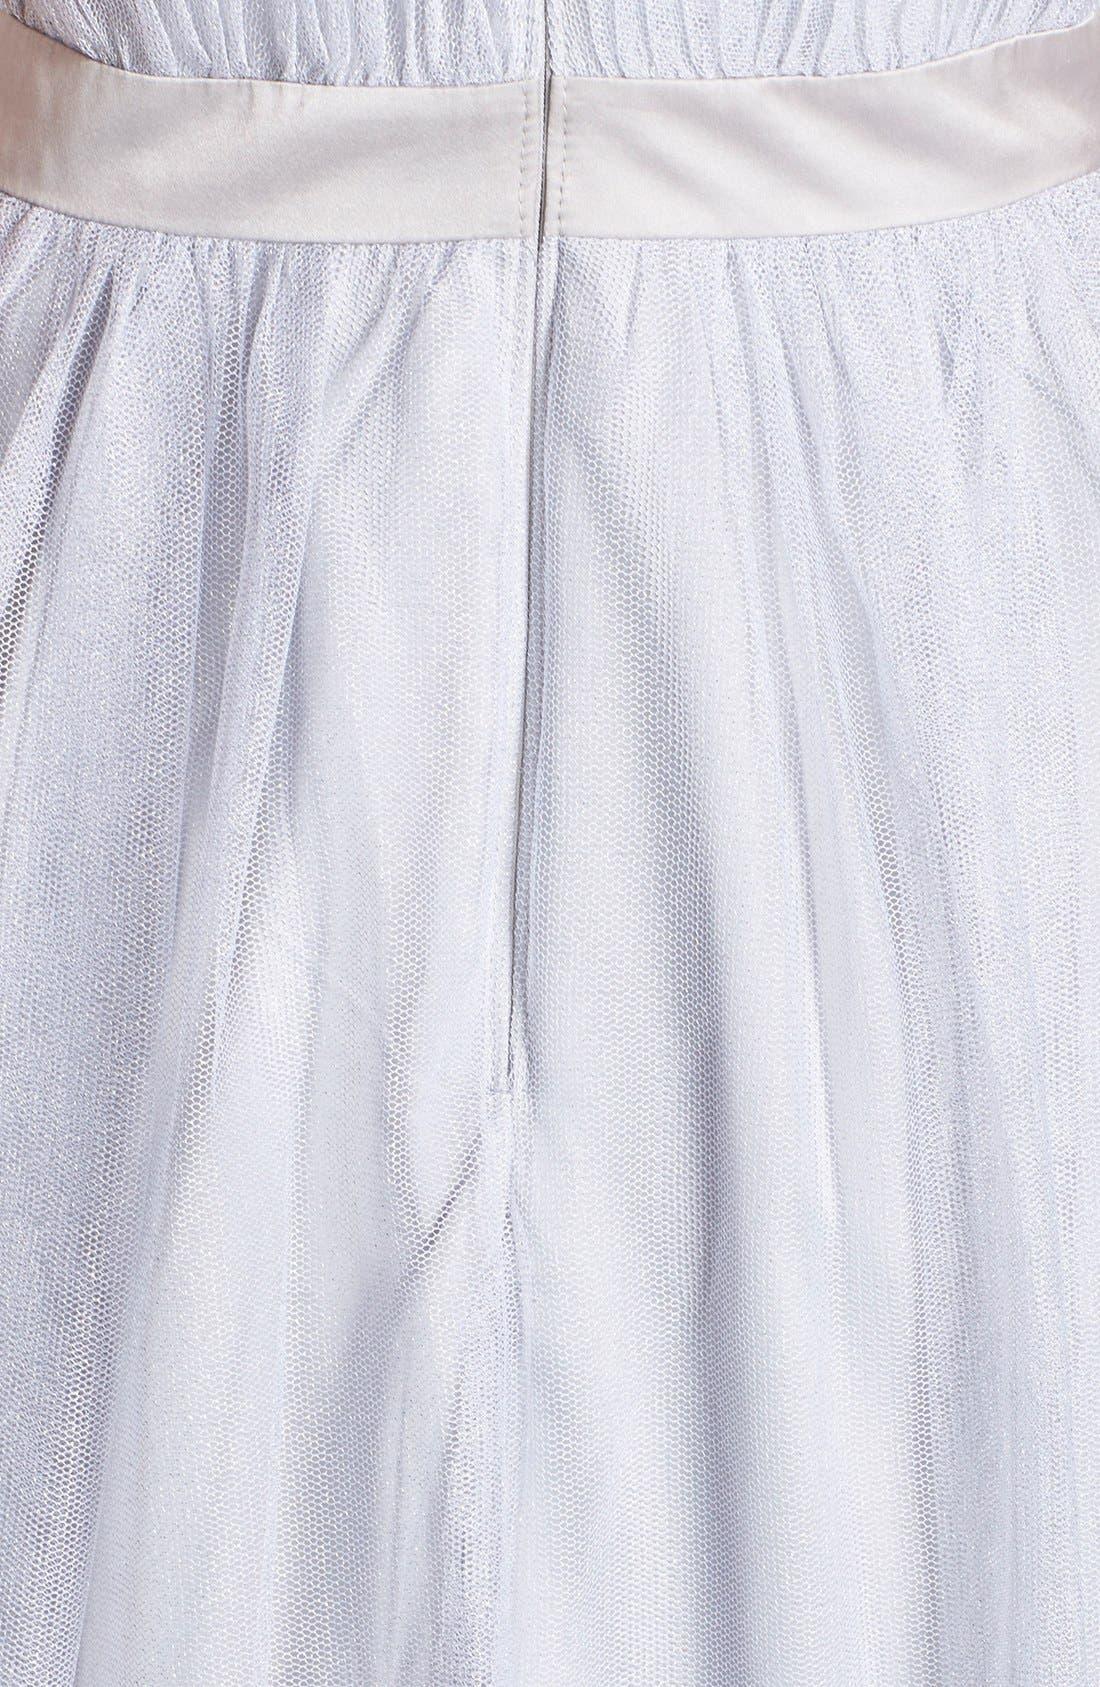 Alternate Image 3  - Aidan by Aidan Mattox Shimmer Mesh Fit & Flare Dress